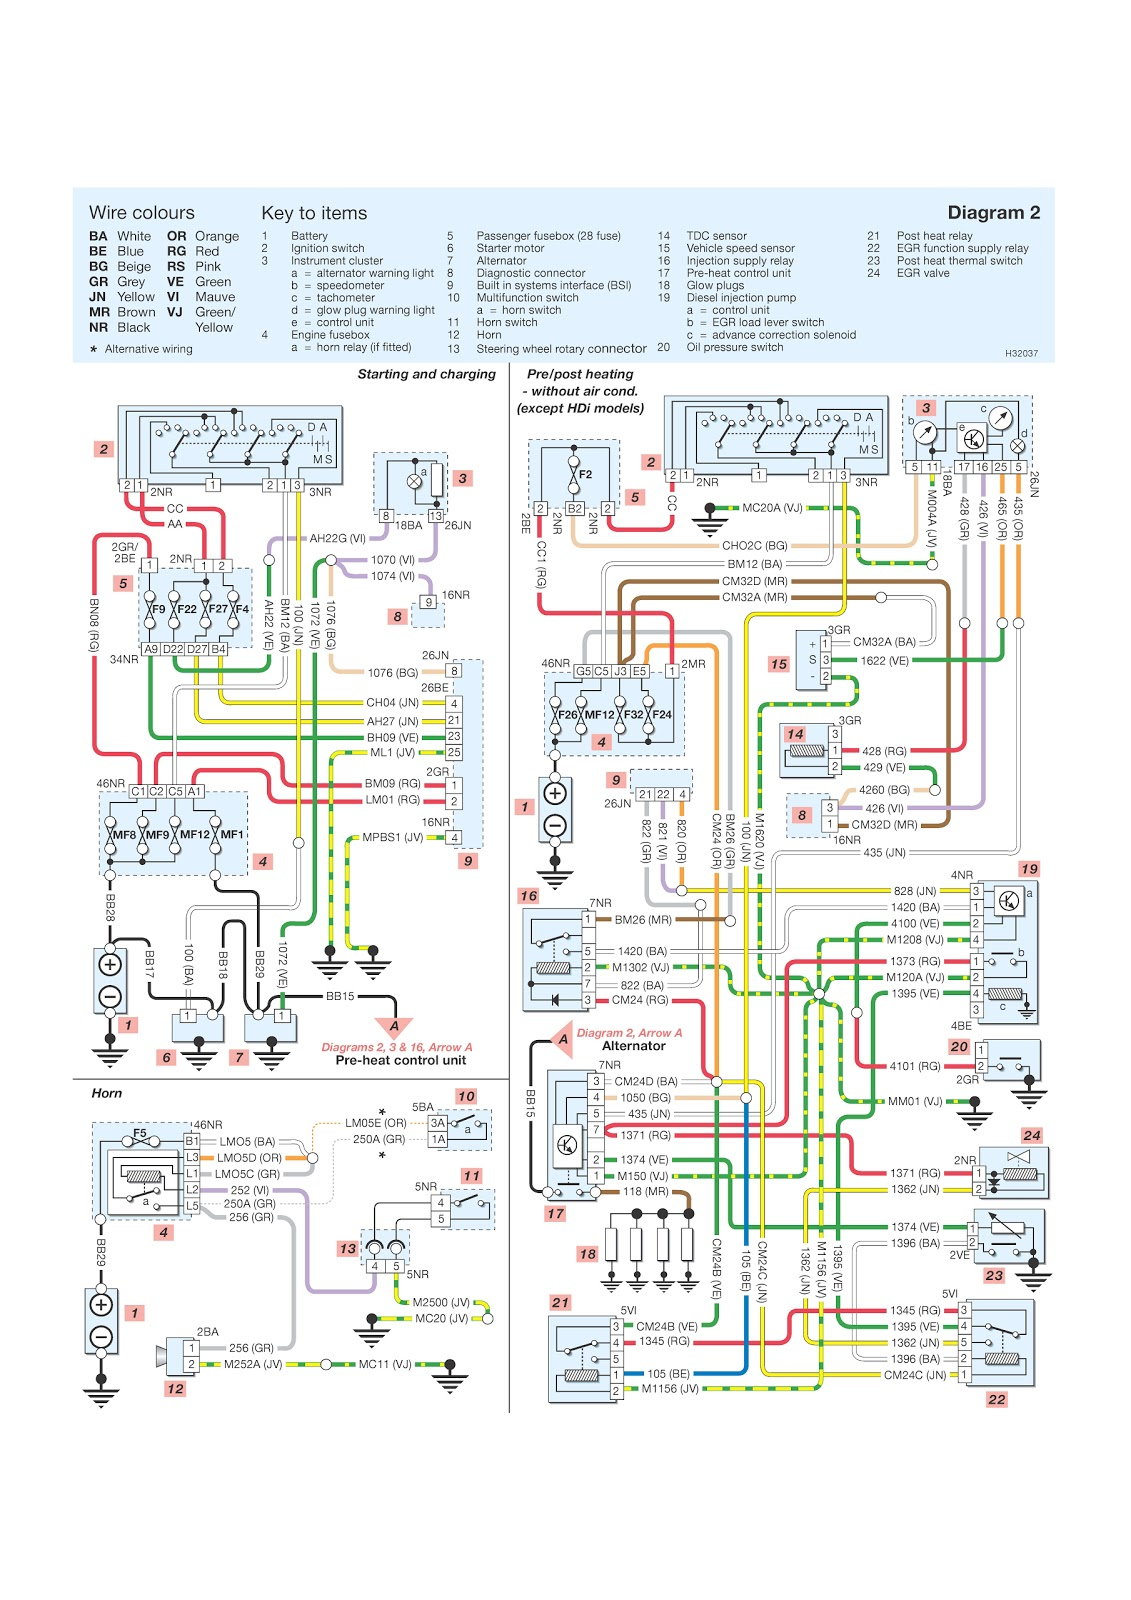 Peugeot 206 Wiring Diagram Airbag Efcaviation Com